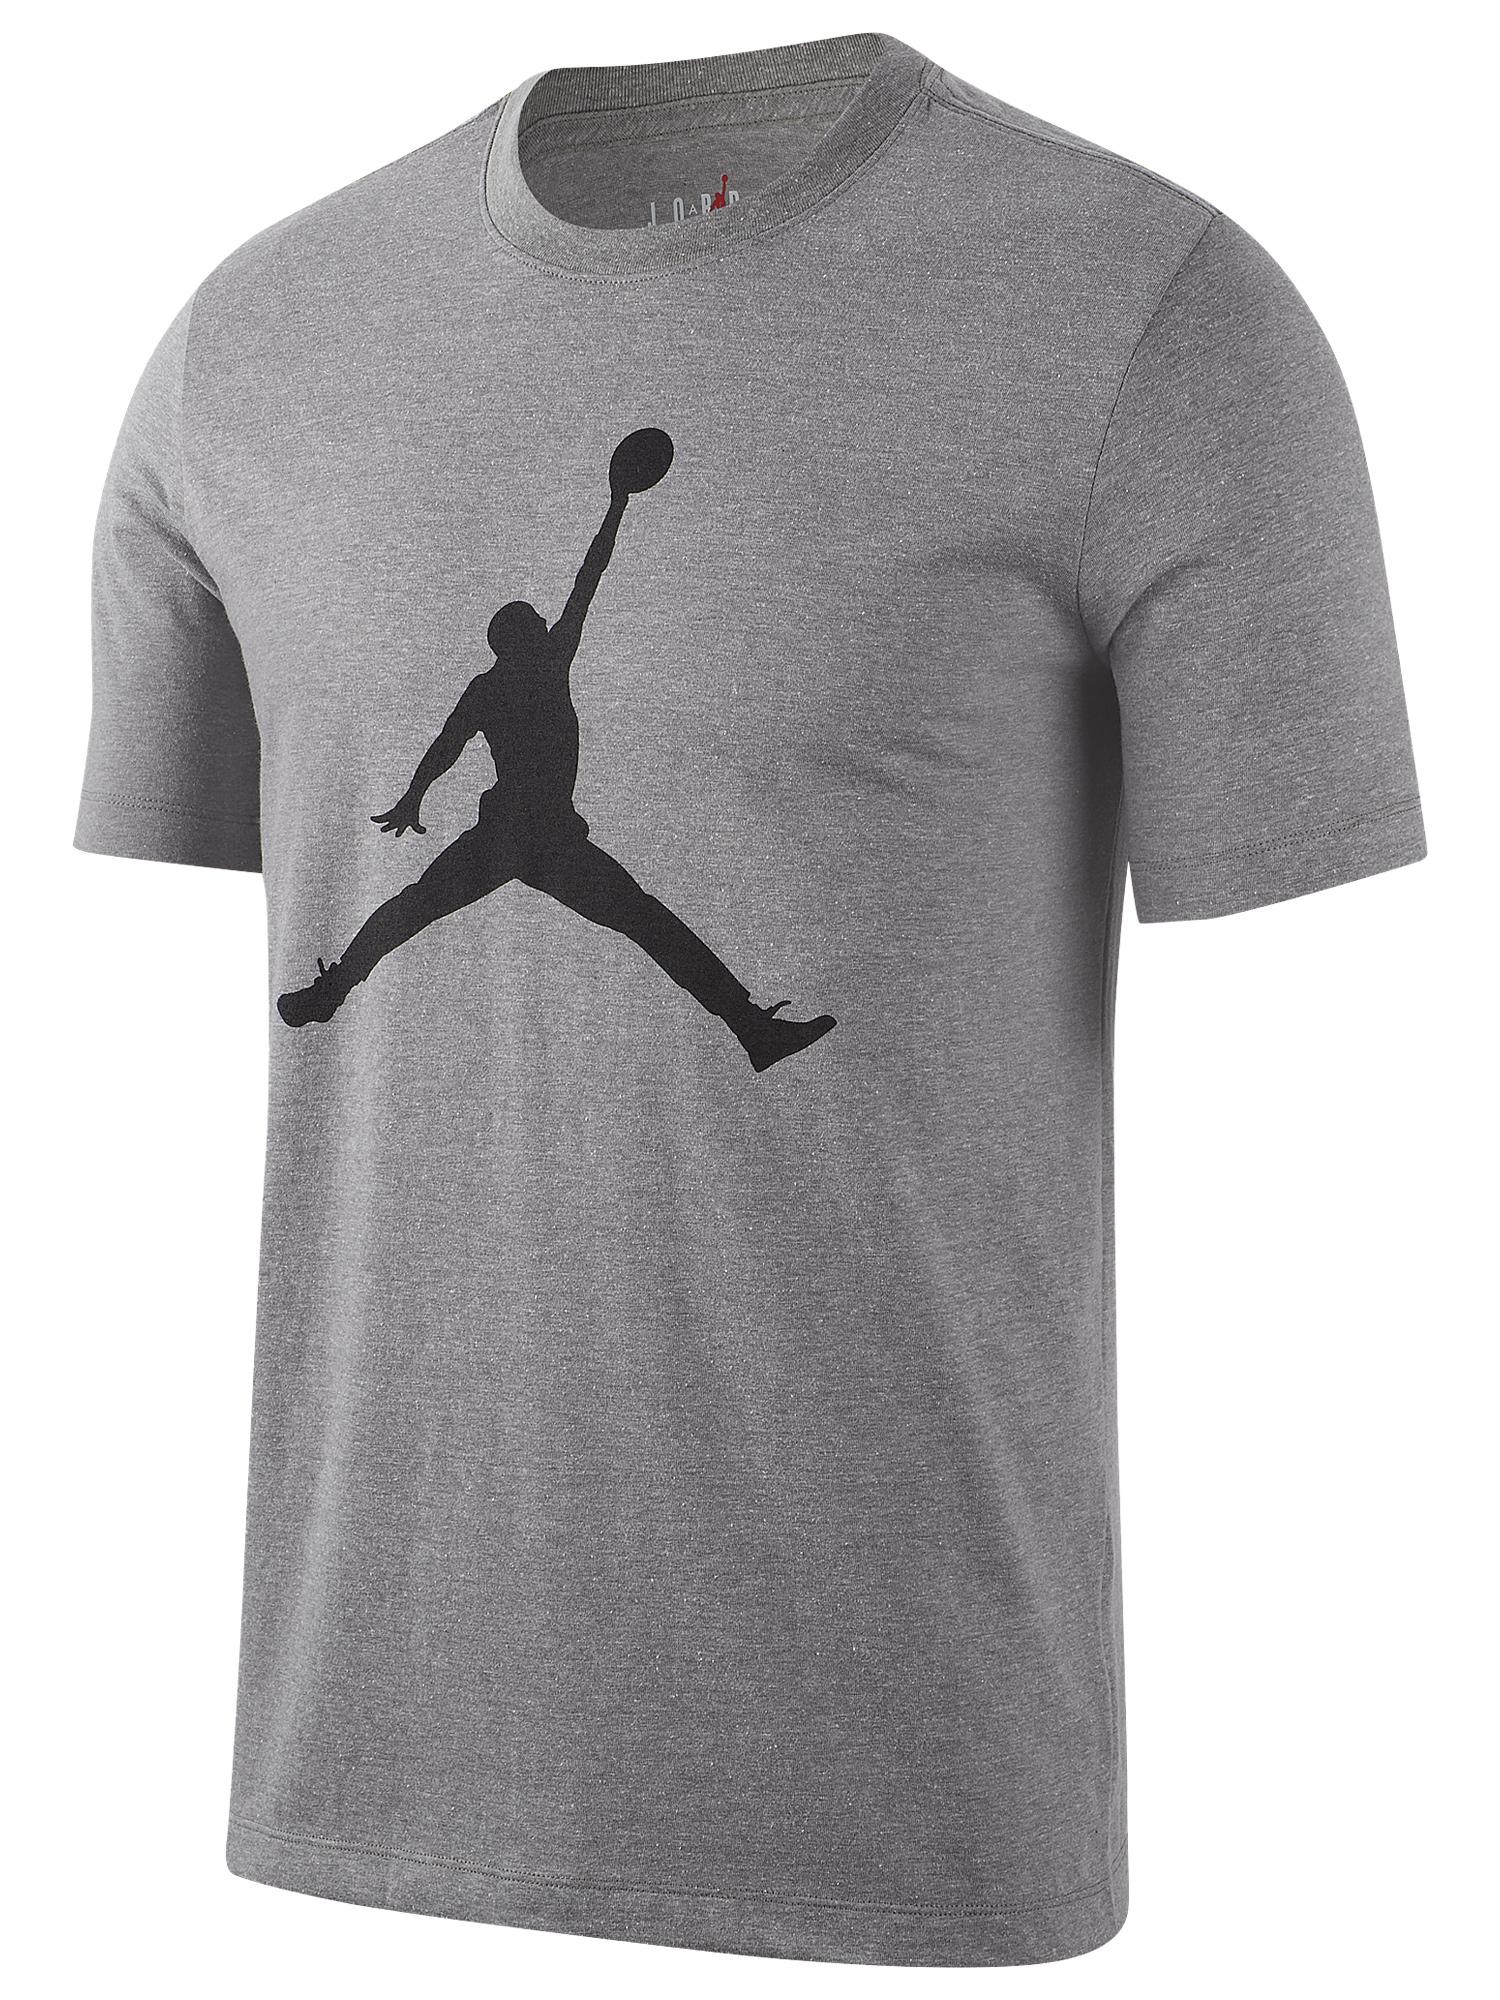 jordan-6-bordeaux-shirt